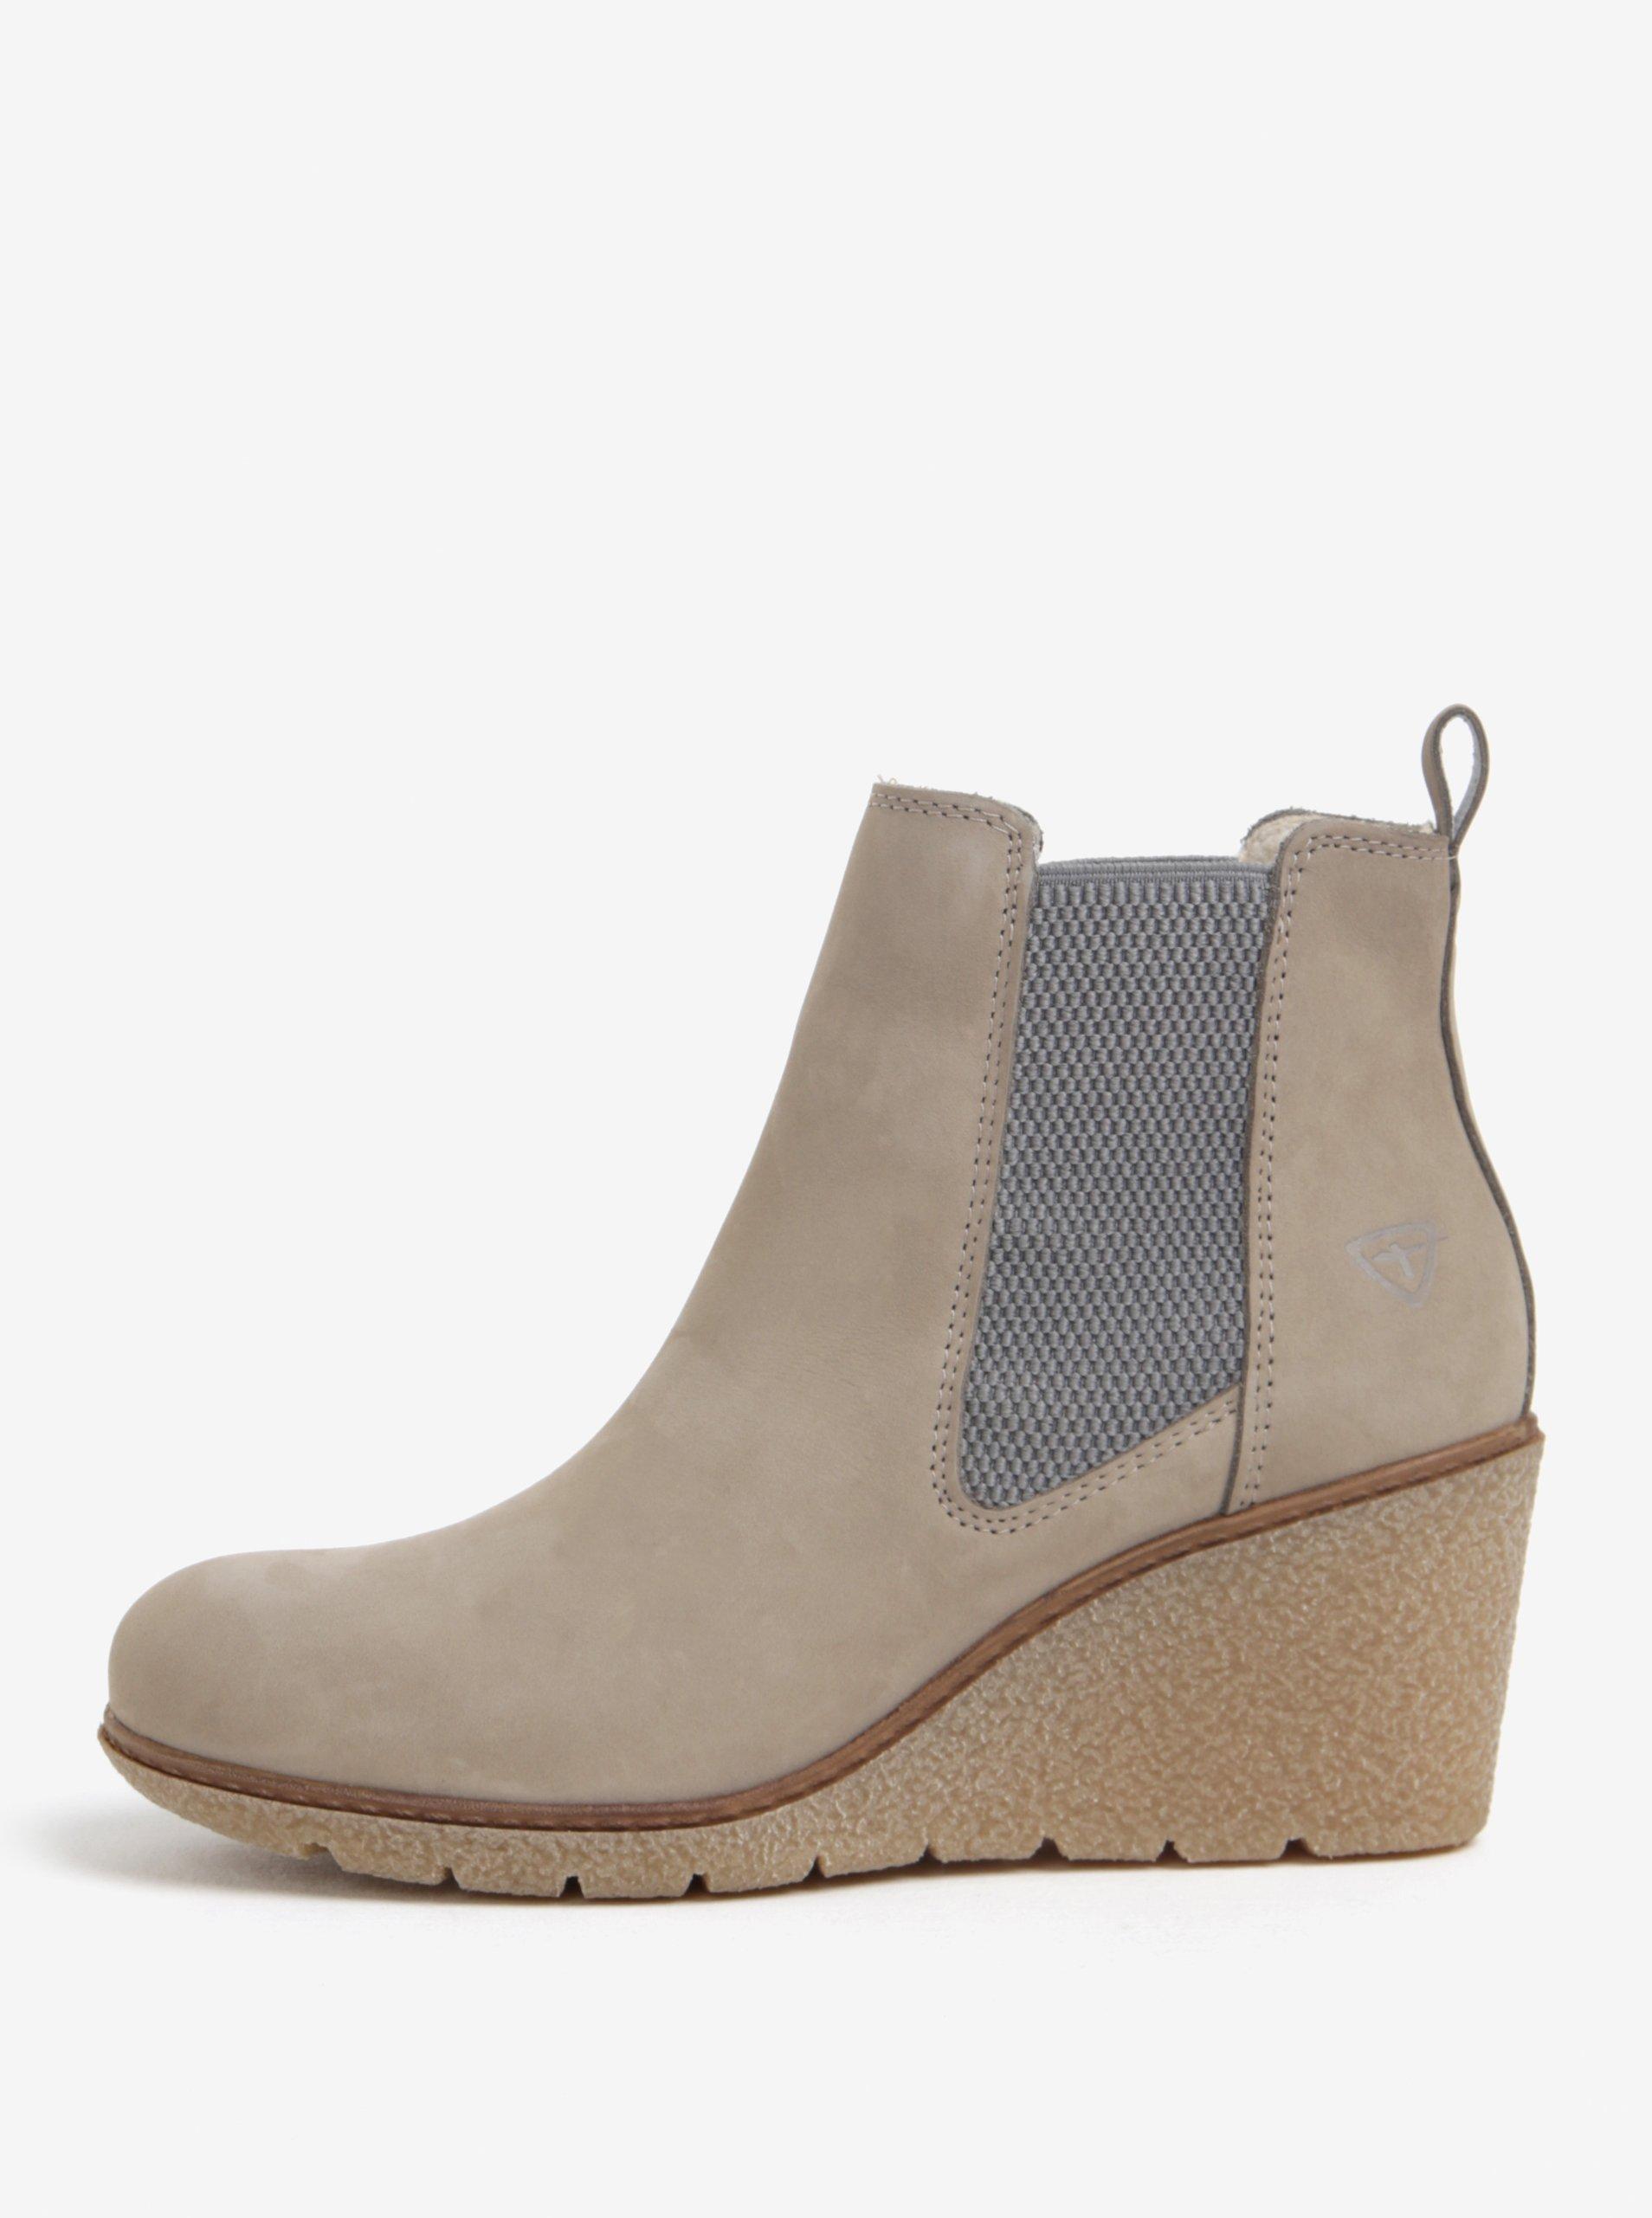 Béžové kožené kotníkové chelsea boty na klínku Tamaris